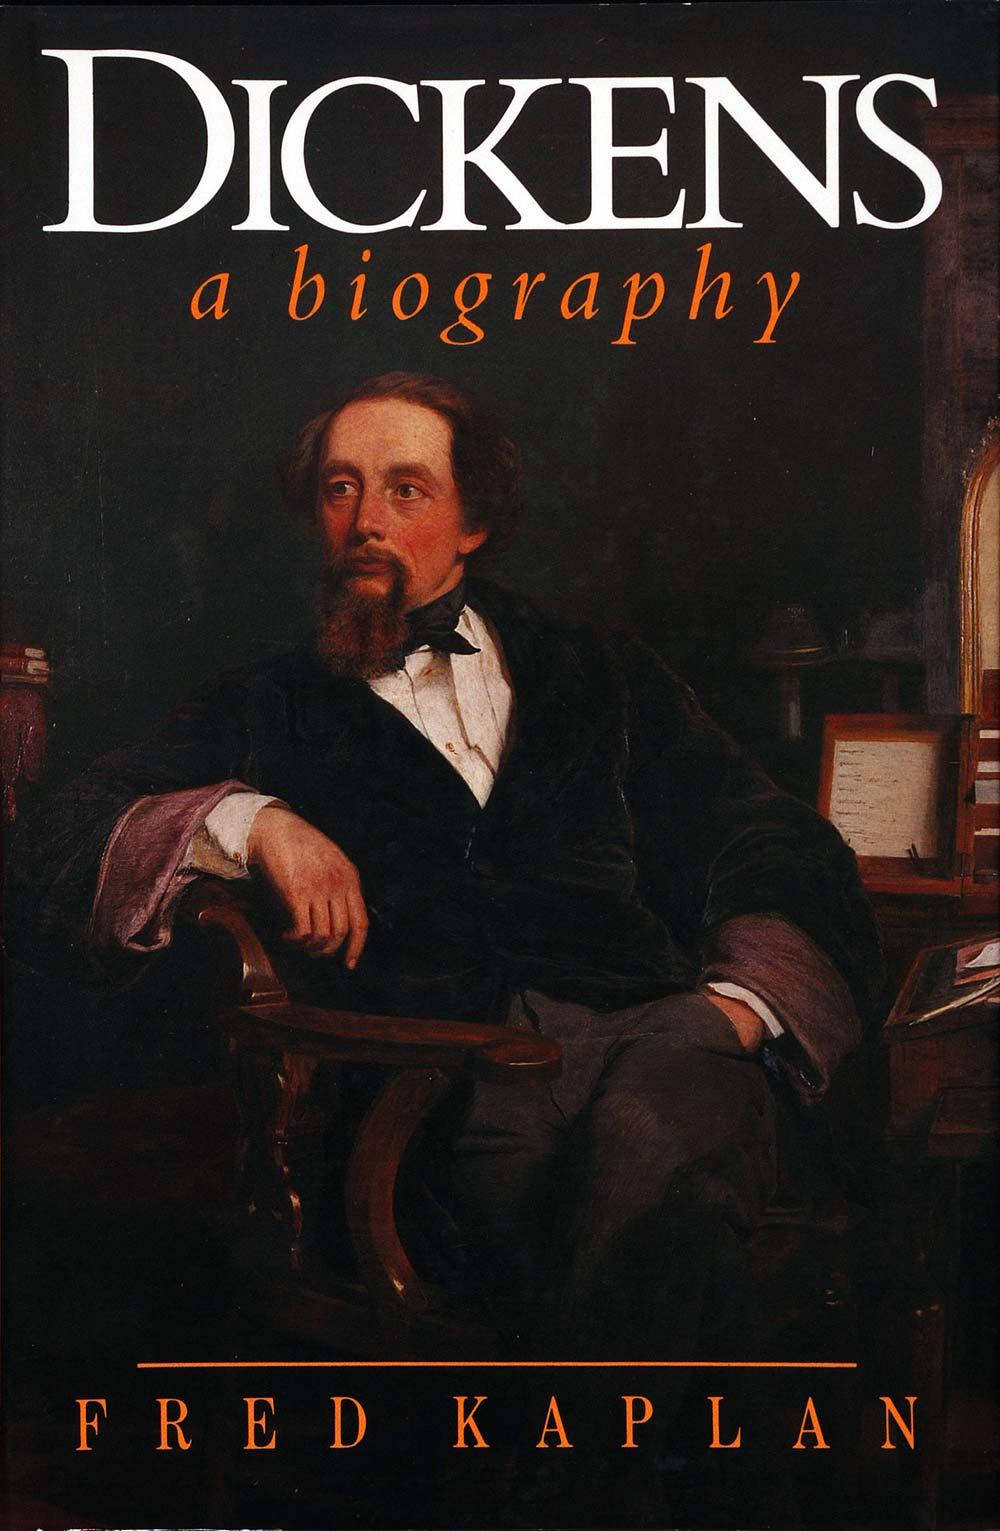 Fred Kaplan. Dickens: A Biography. London: Hodder & Stoughton, 1988